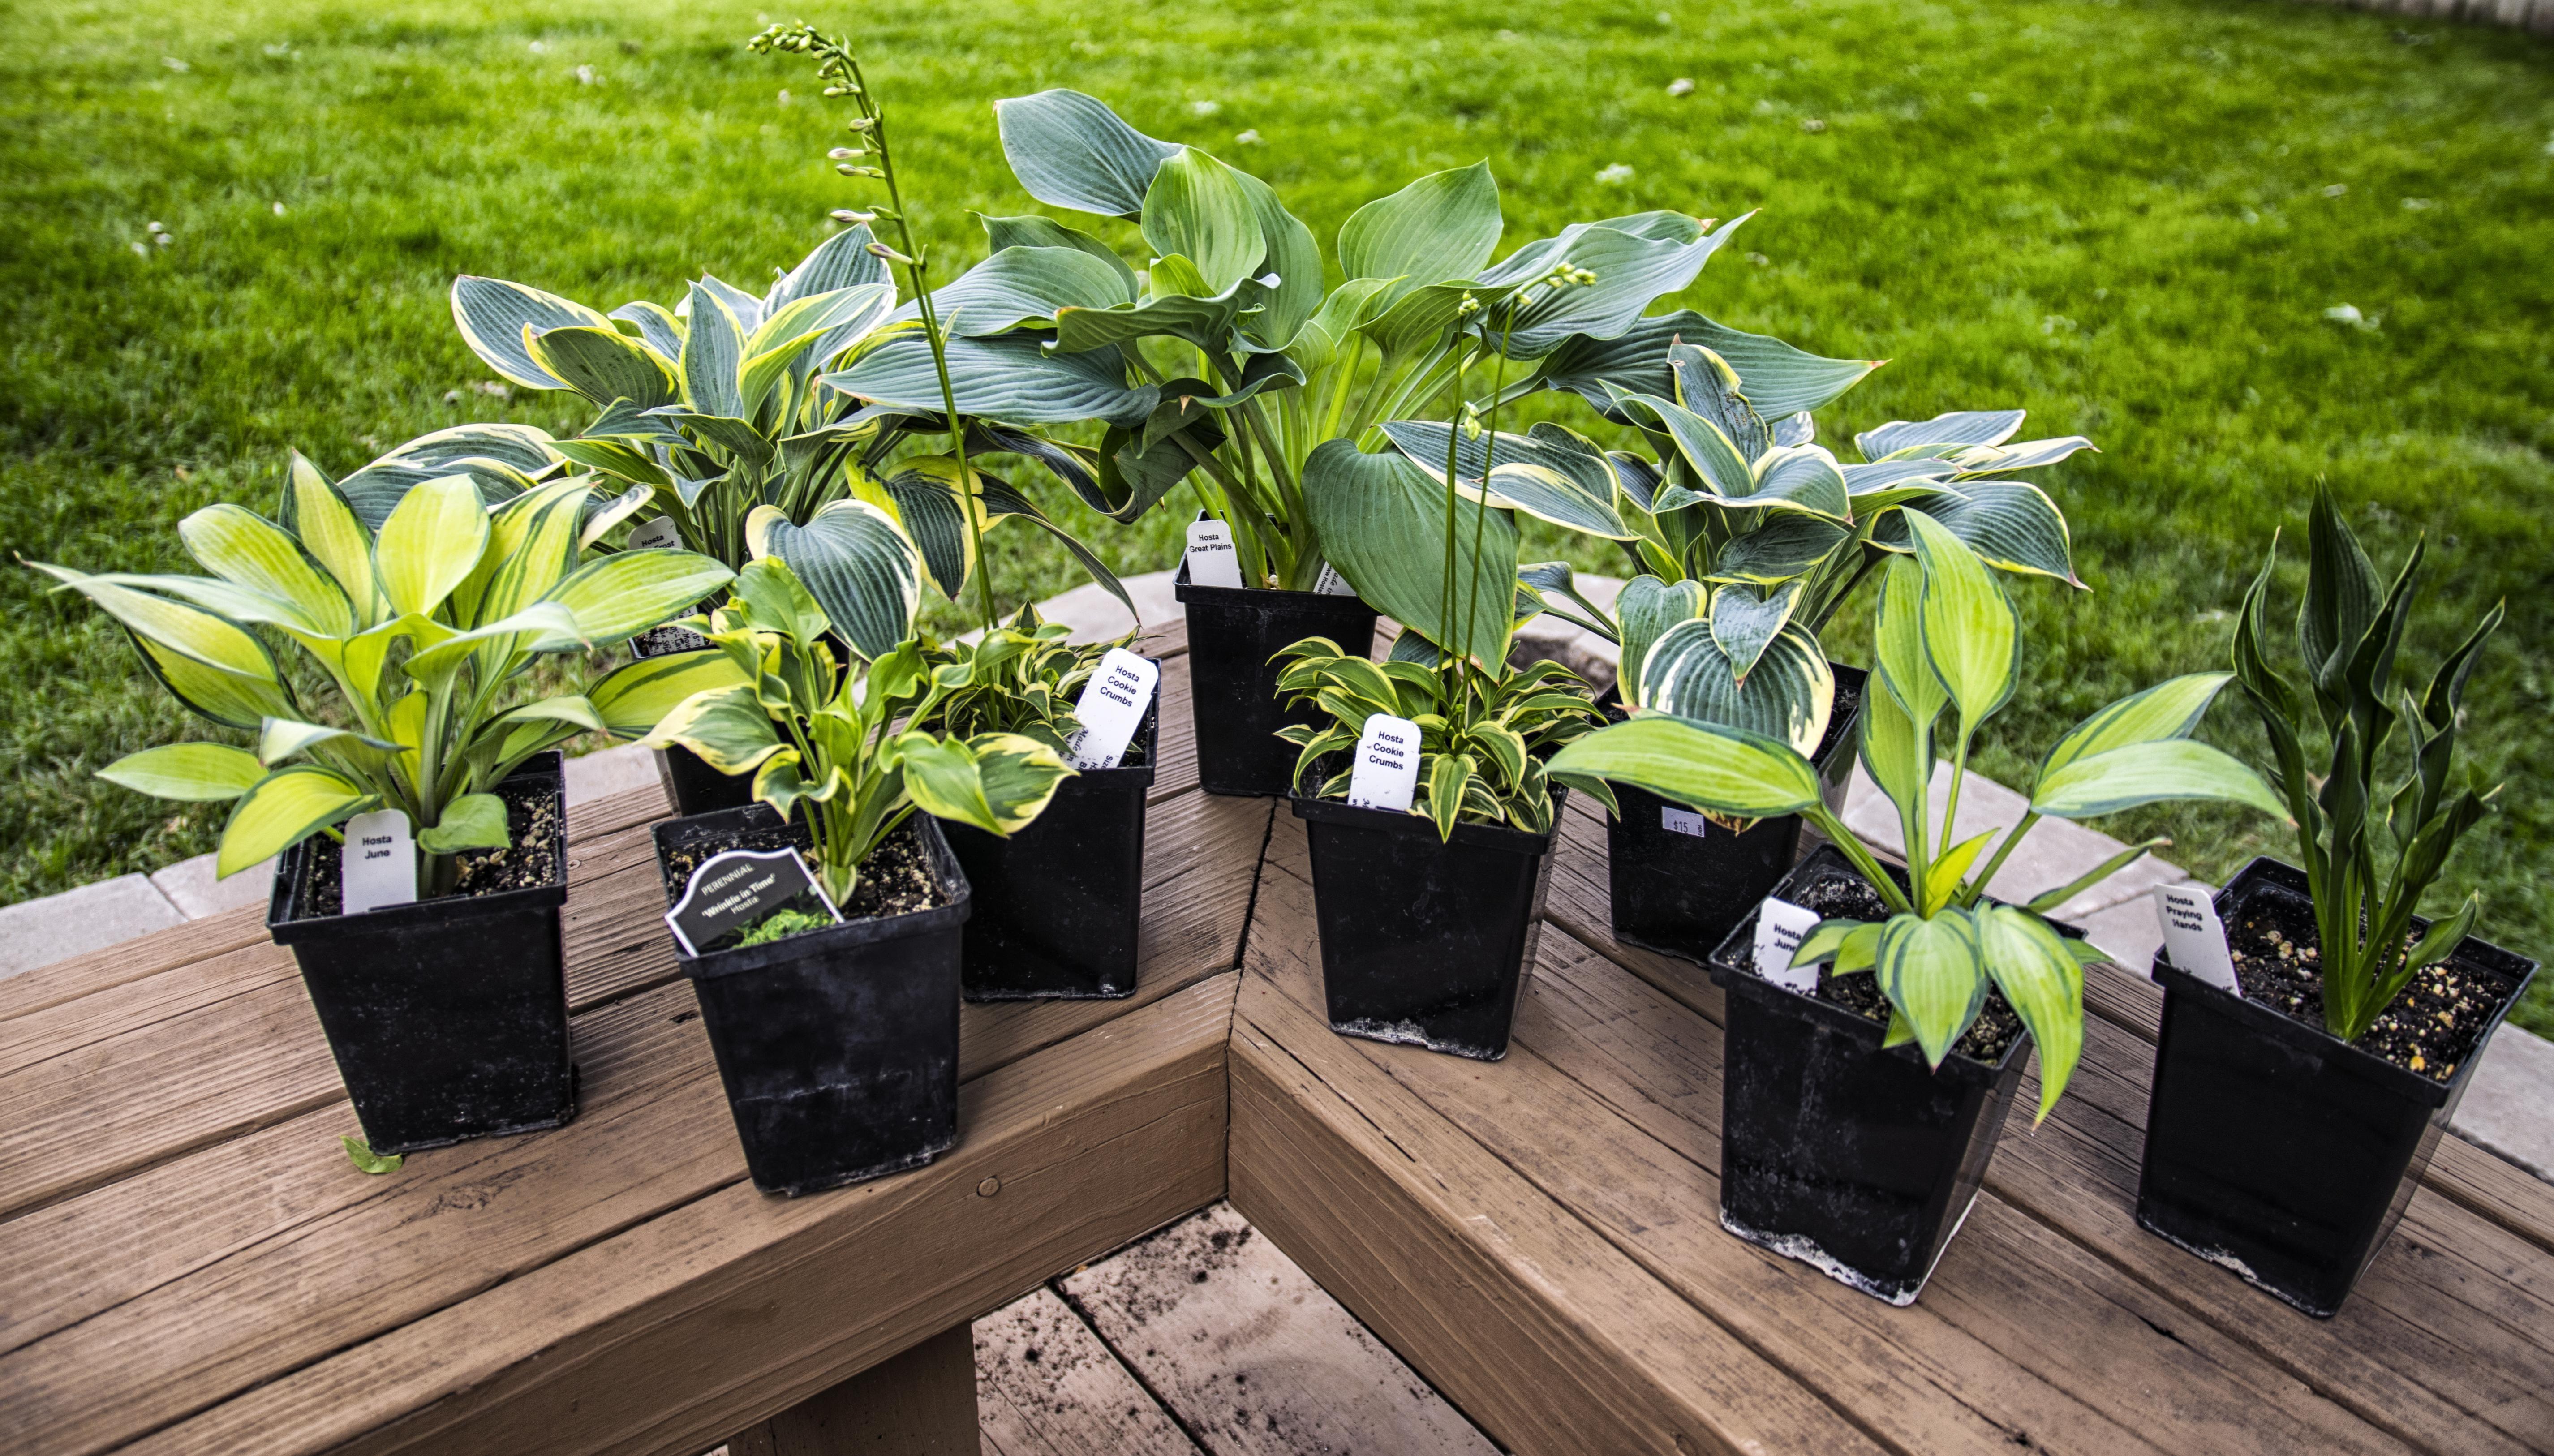 So it begins... Hostas for my very first garden! #gardening #garden #gardens #DIY #landscaping #home #horticulture #flowers #gardenchat #roses #nature